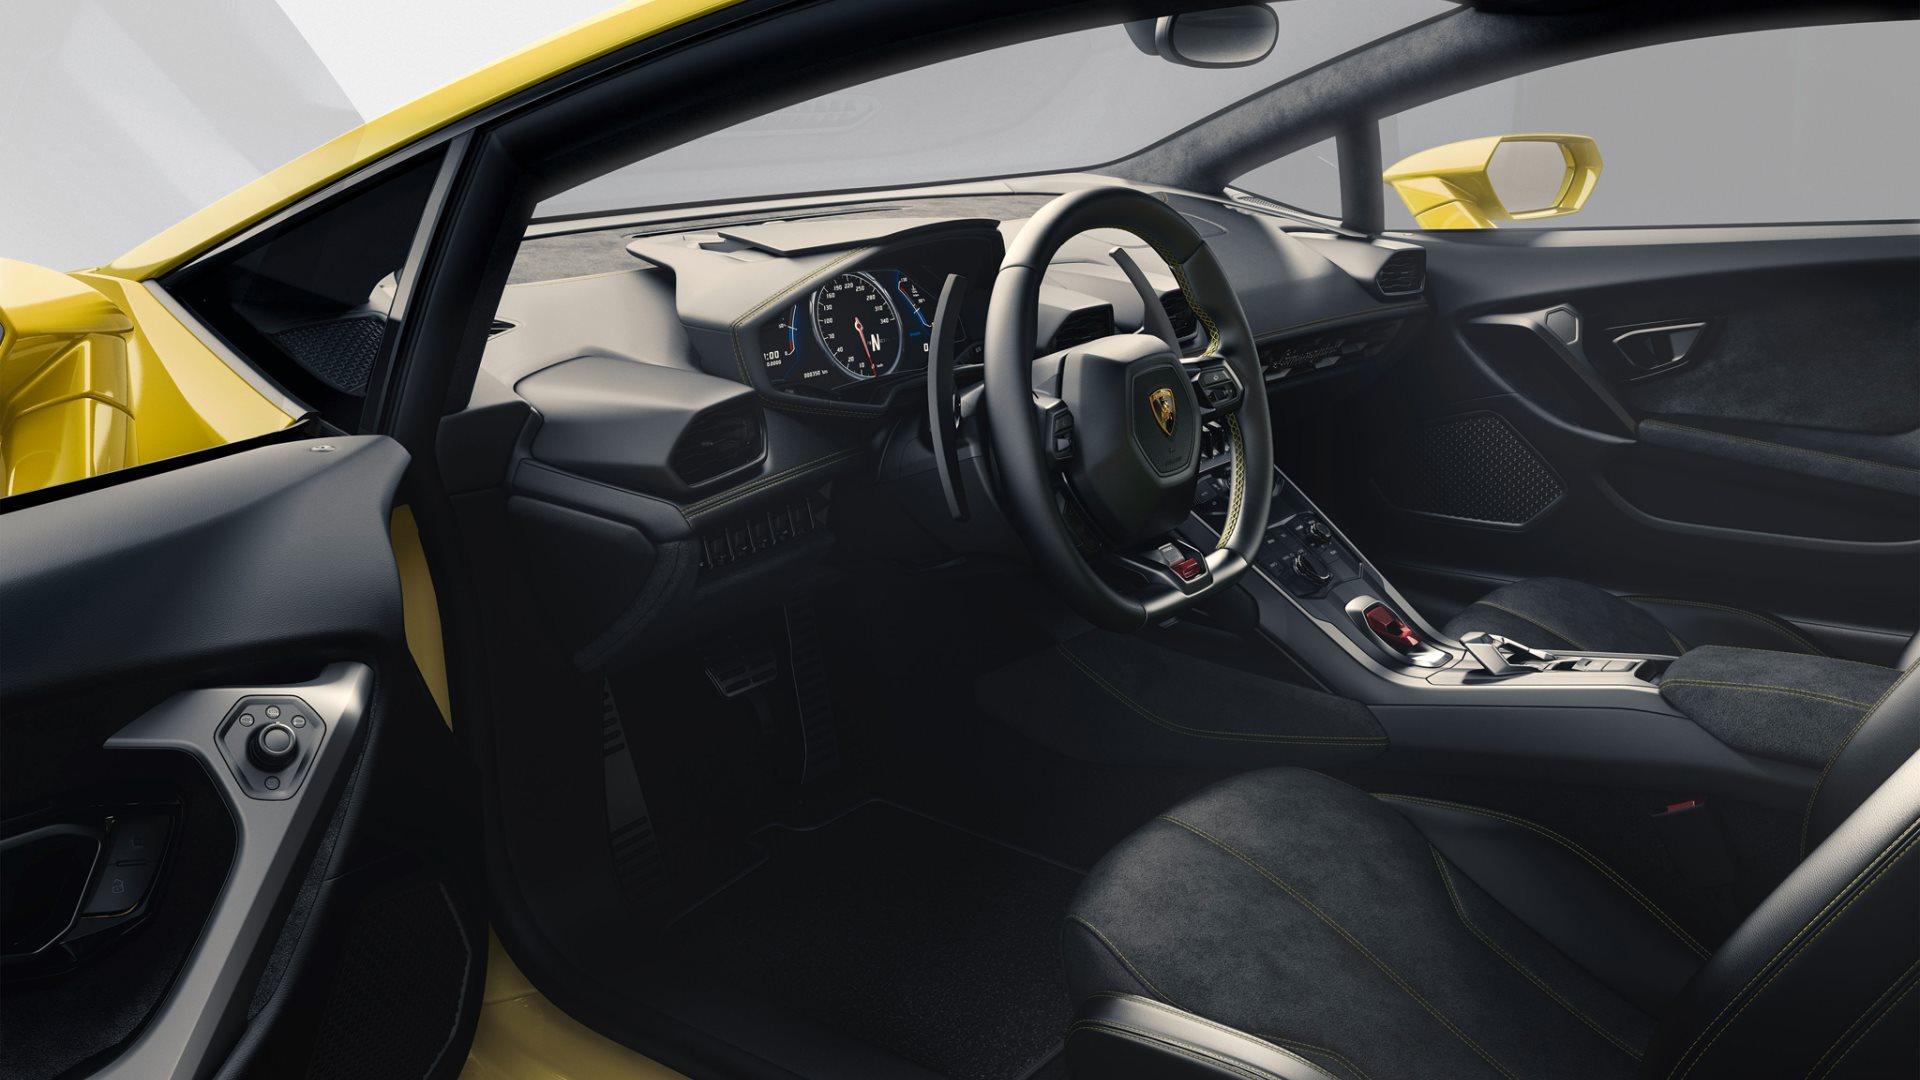 Lamborghini+Huracan+LP610-4+interior+design+HD Breathtaking Price Of Lamborghini Huracán Lp 610 4 Cars Trend